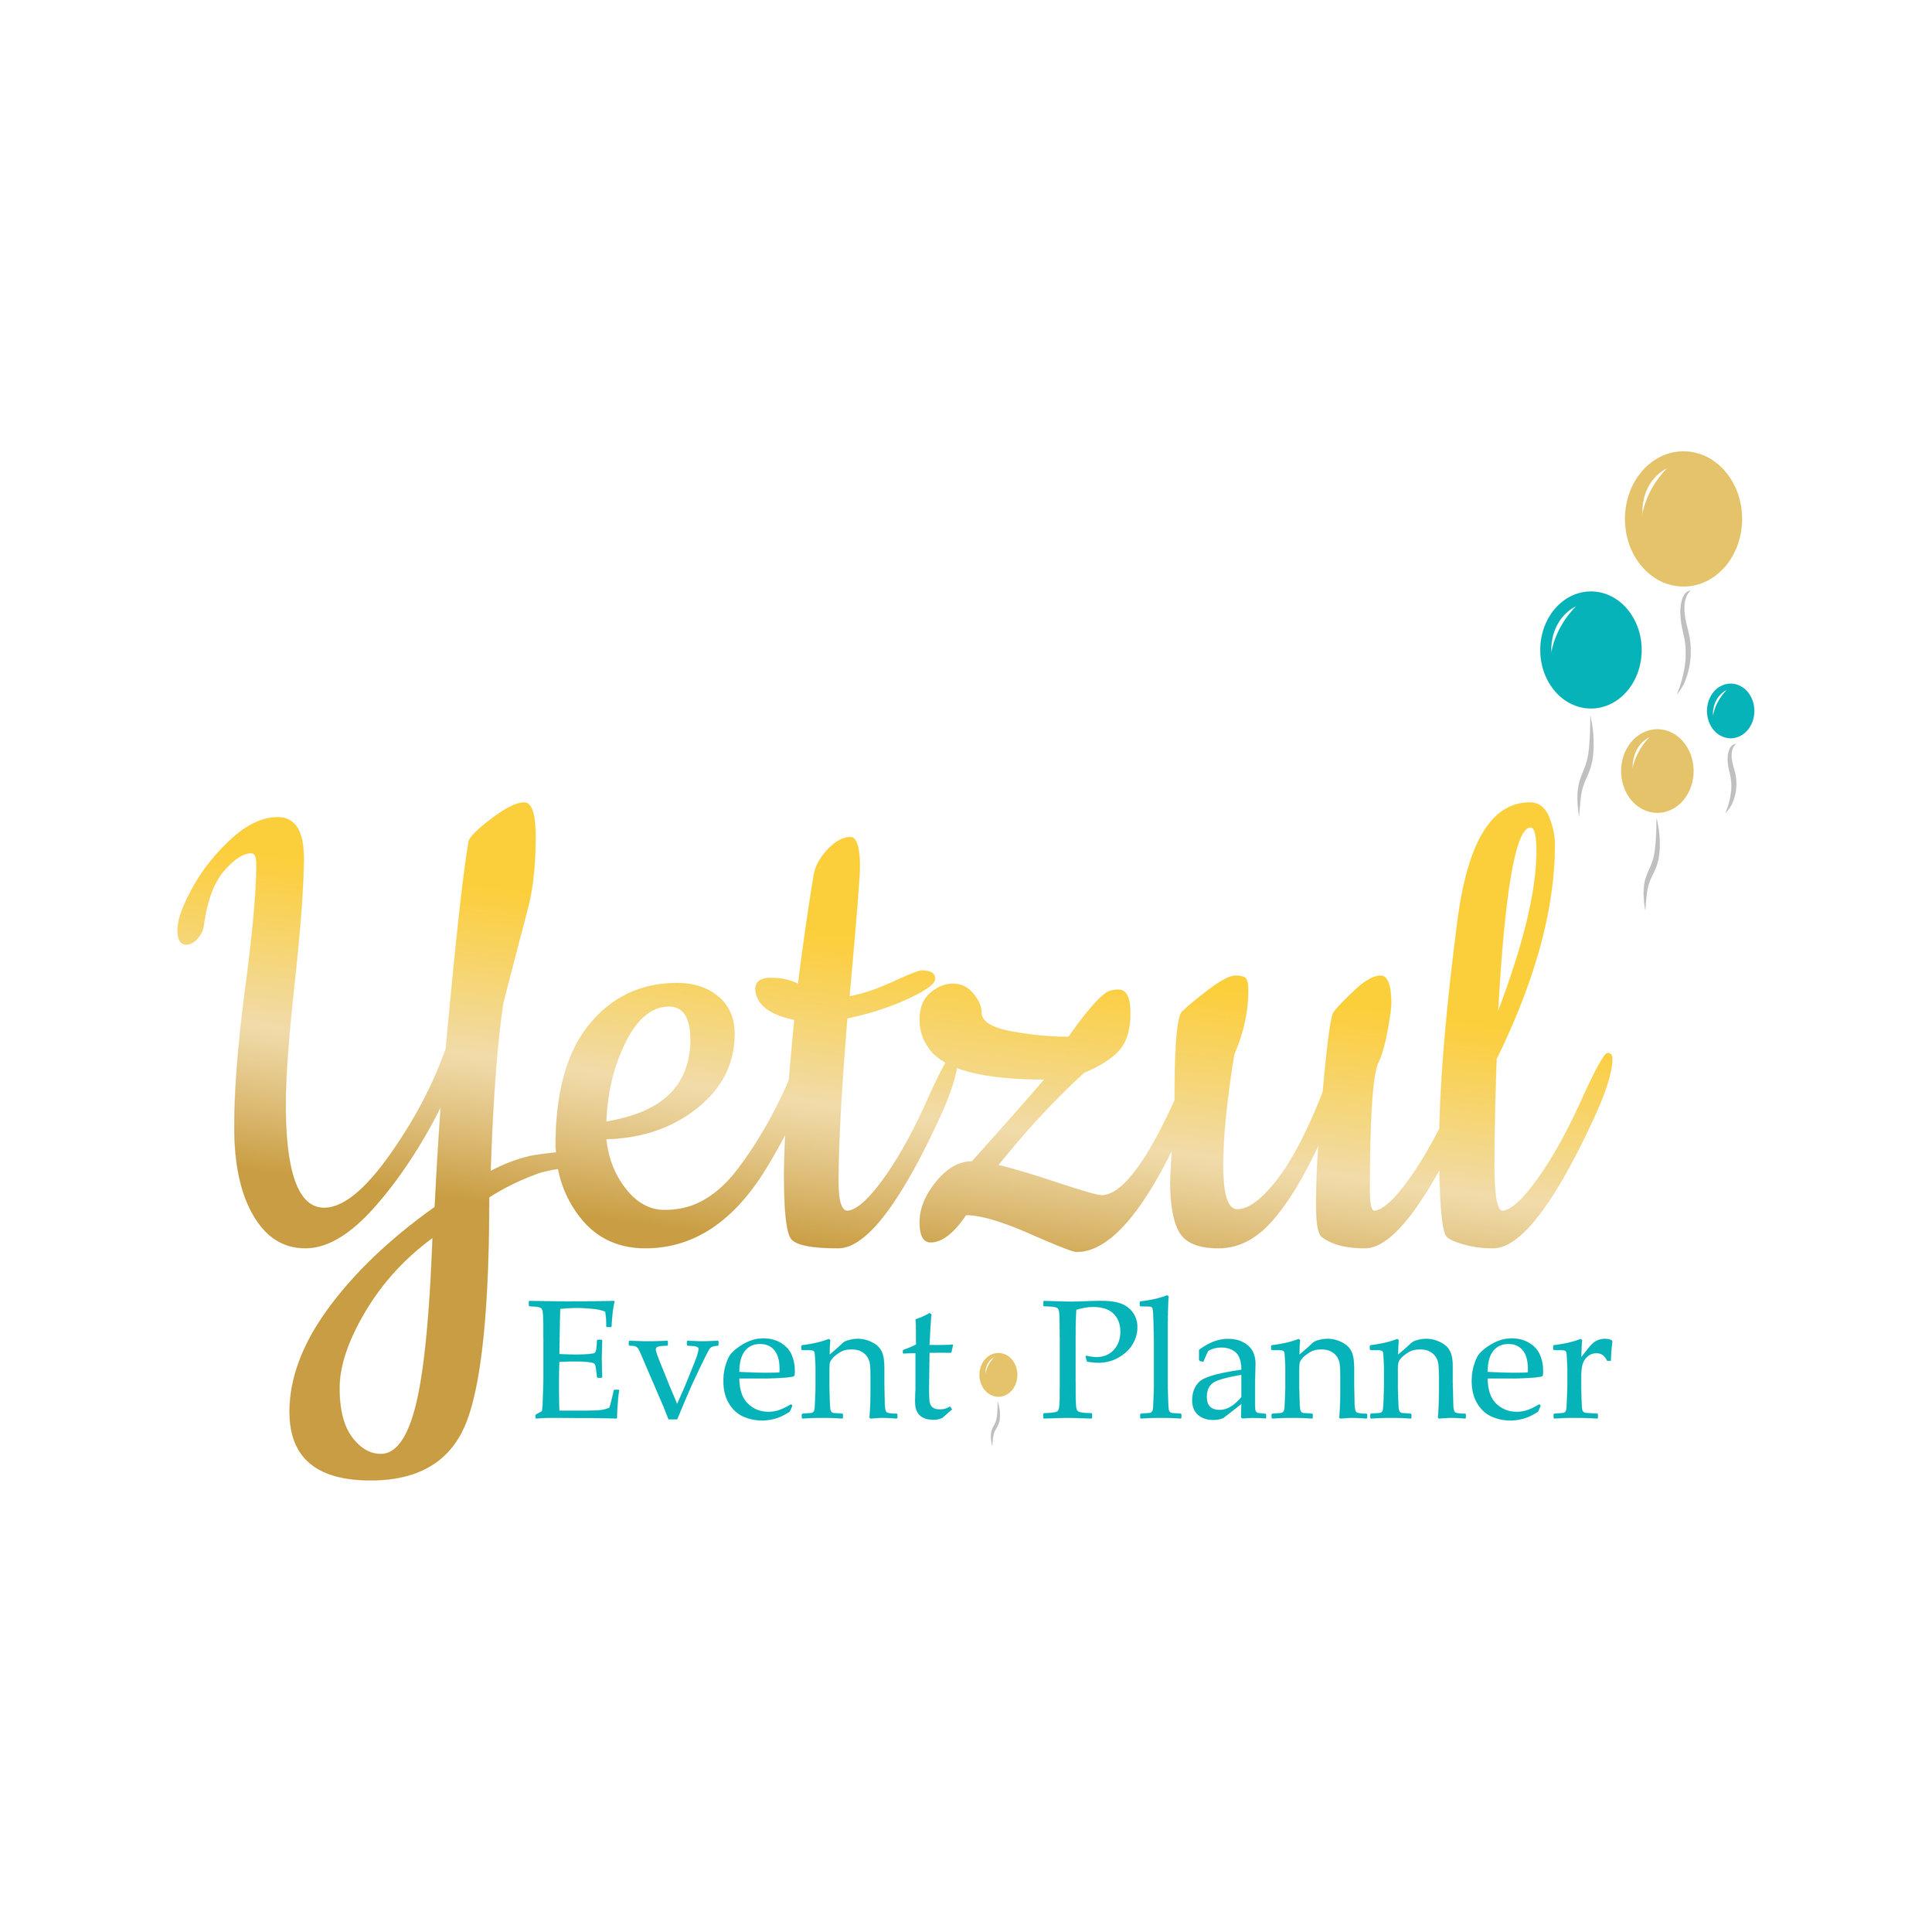 Yetzul Event Planner Logo NEW-01.jpg